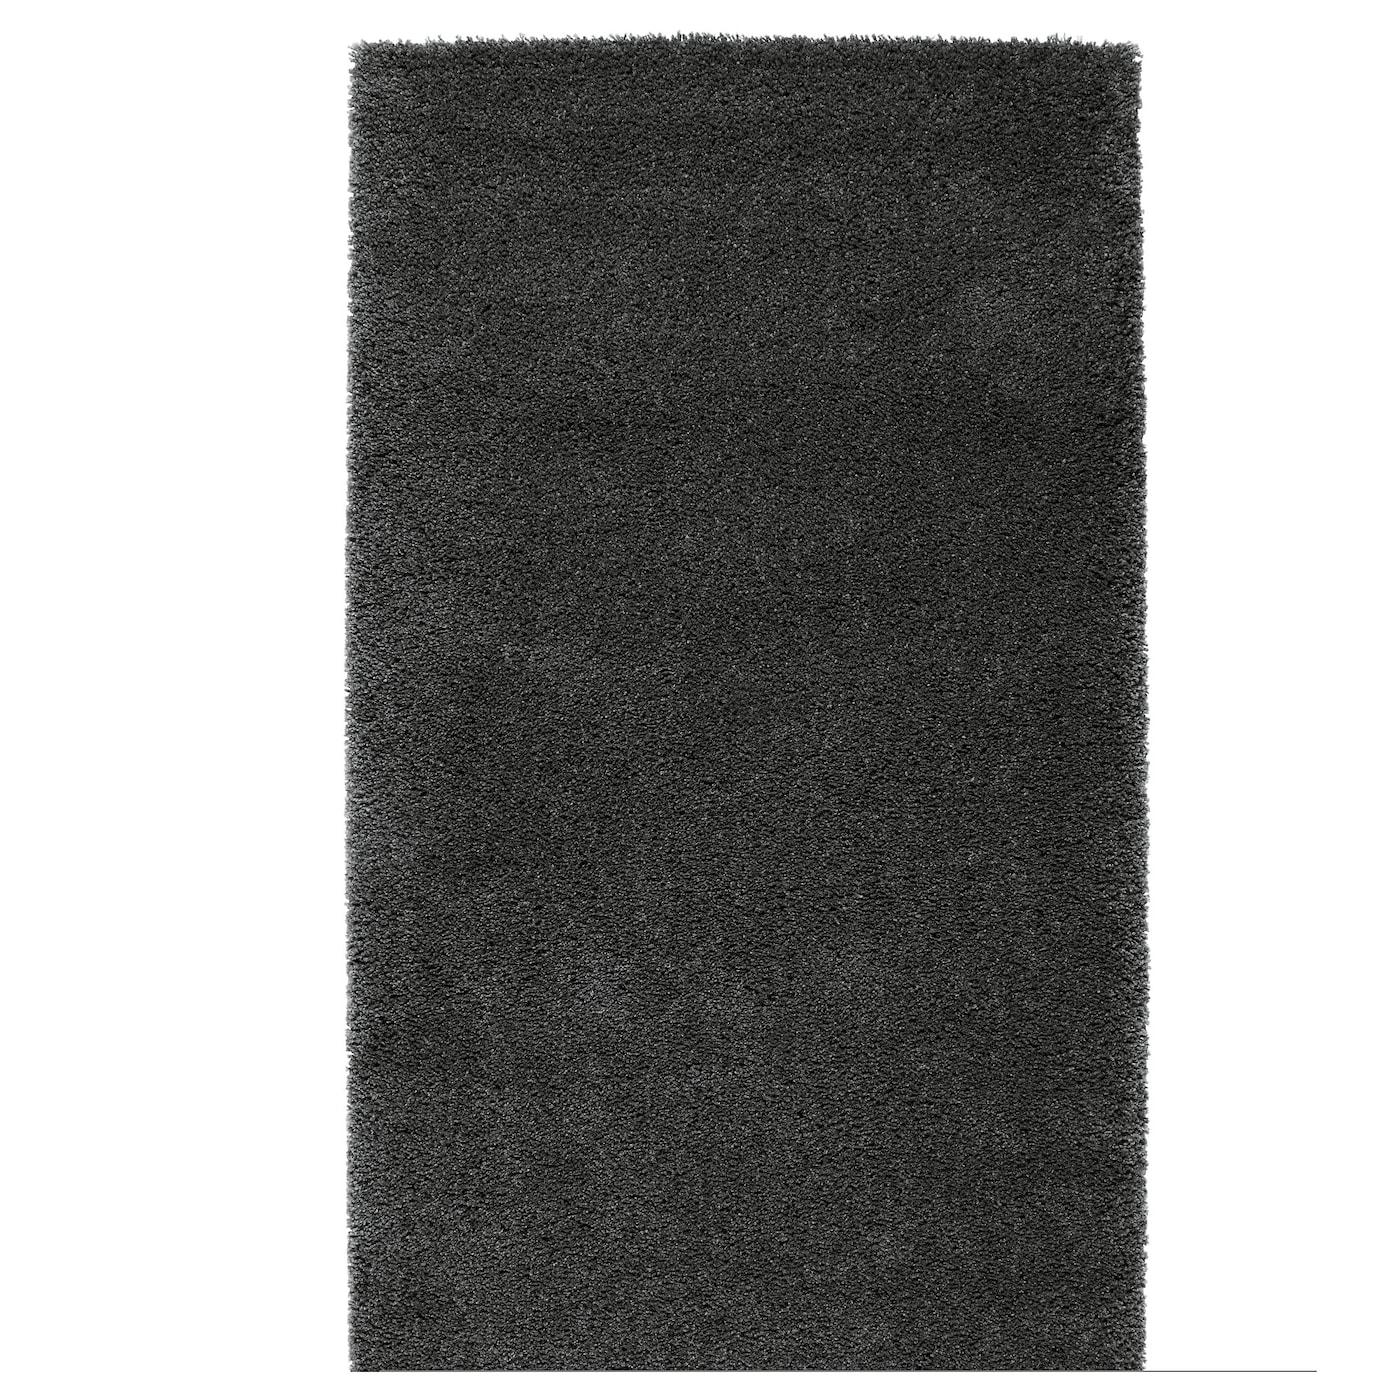 dum tapis poils hauts gris fonc 80x150 cm ikea